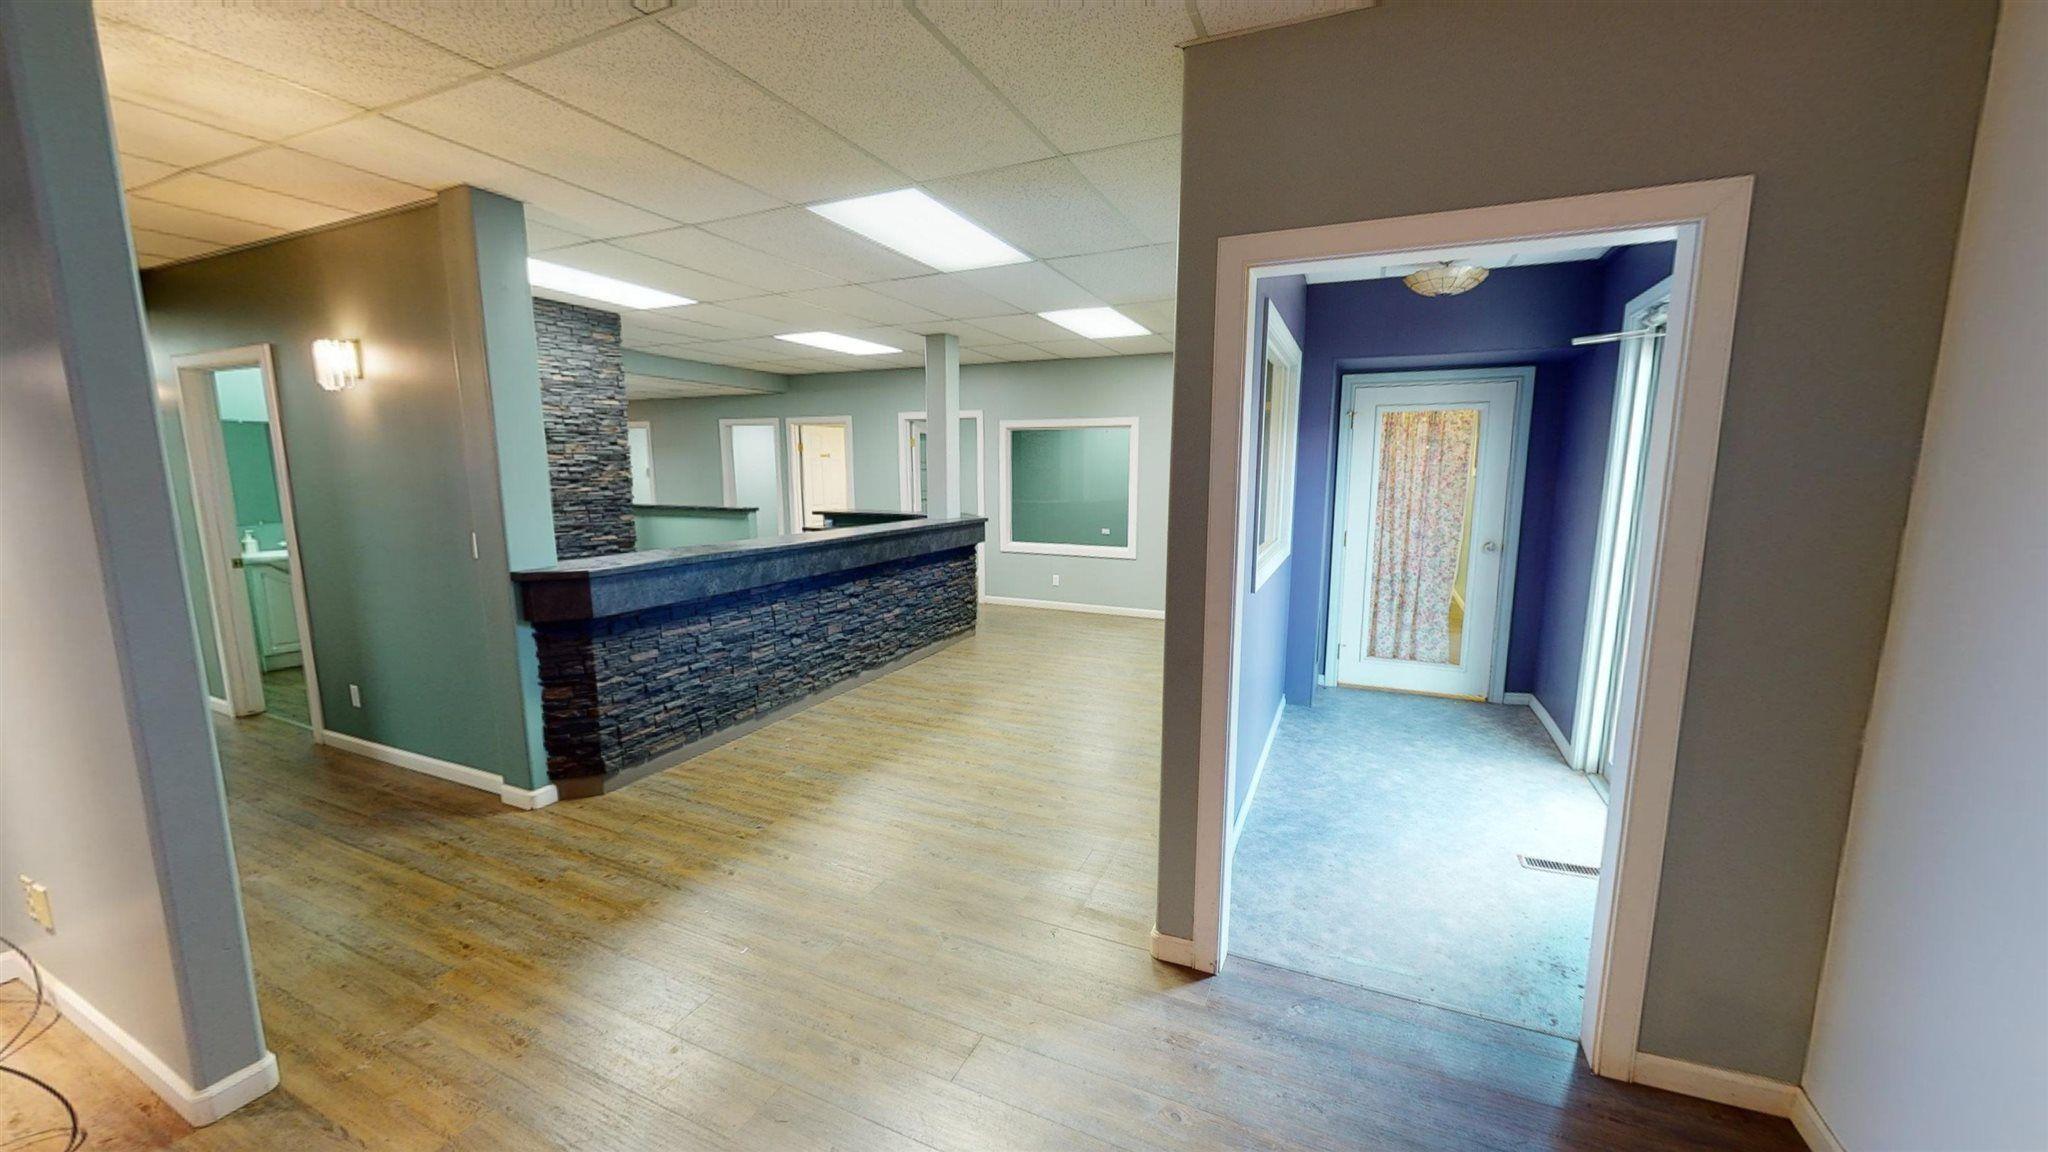 Photo 3: Photos: 10067 100 Avenue in Fort St. John: Fort St. John - City NW Office for sale (Fort St. John (Zone 60))  : MLS®# C8039097